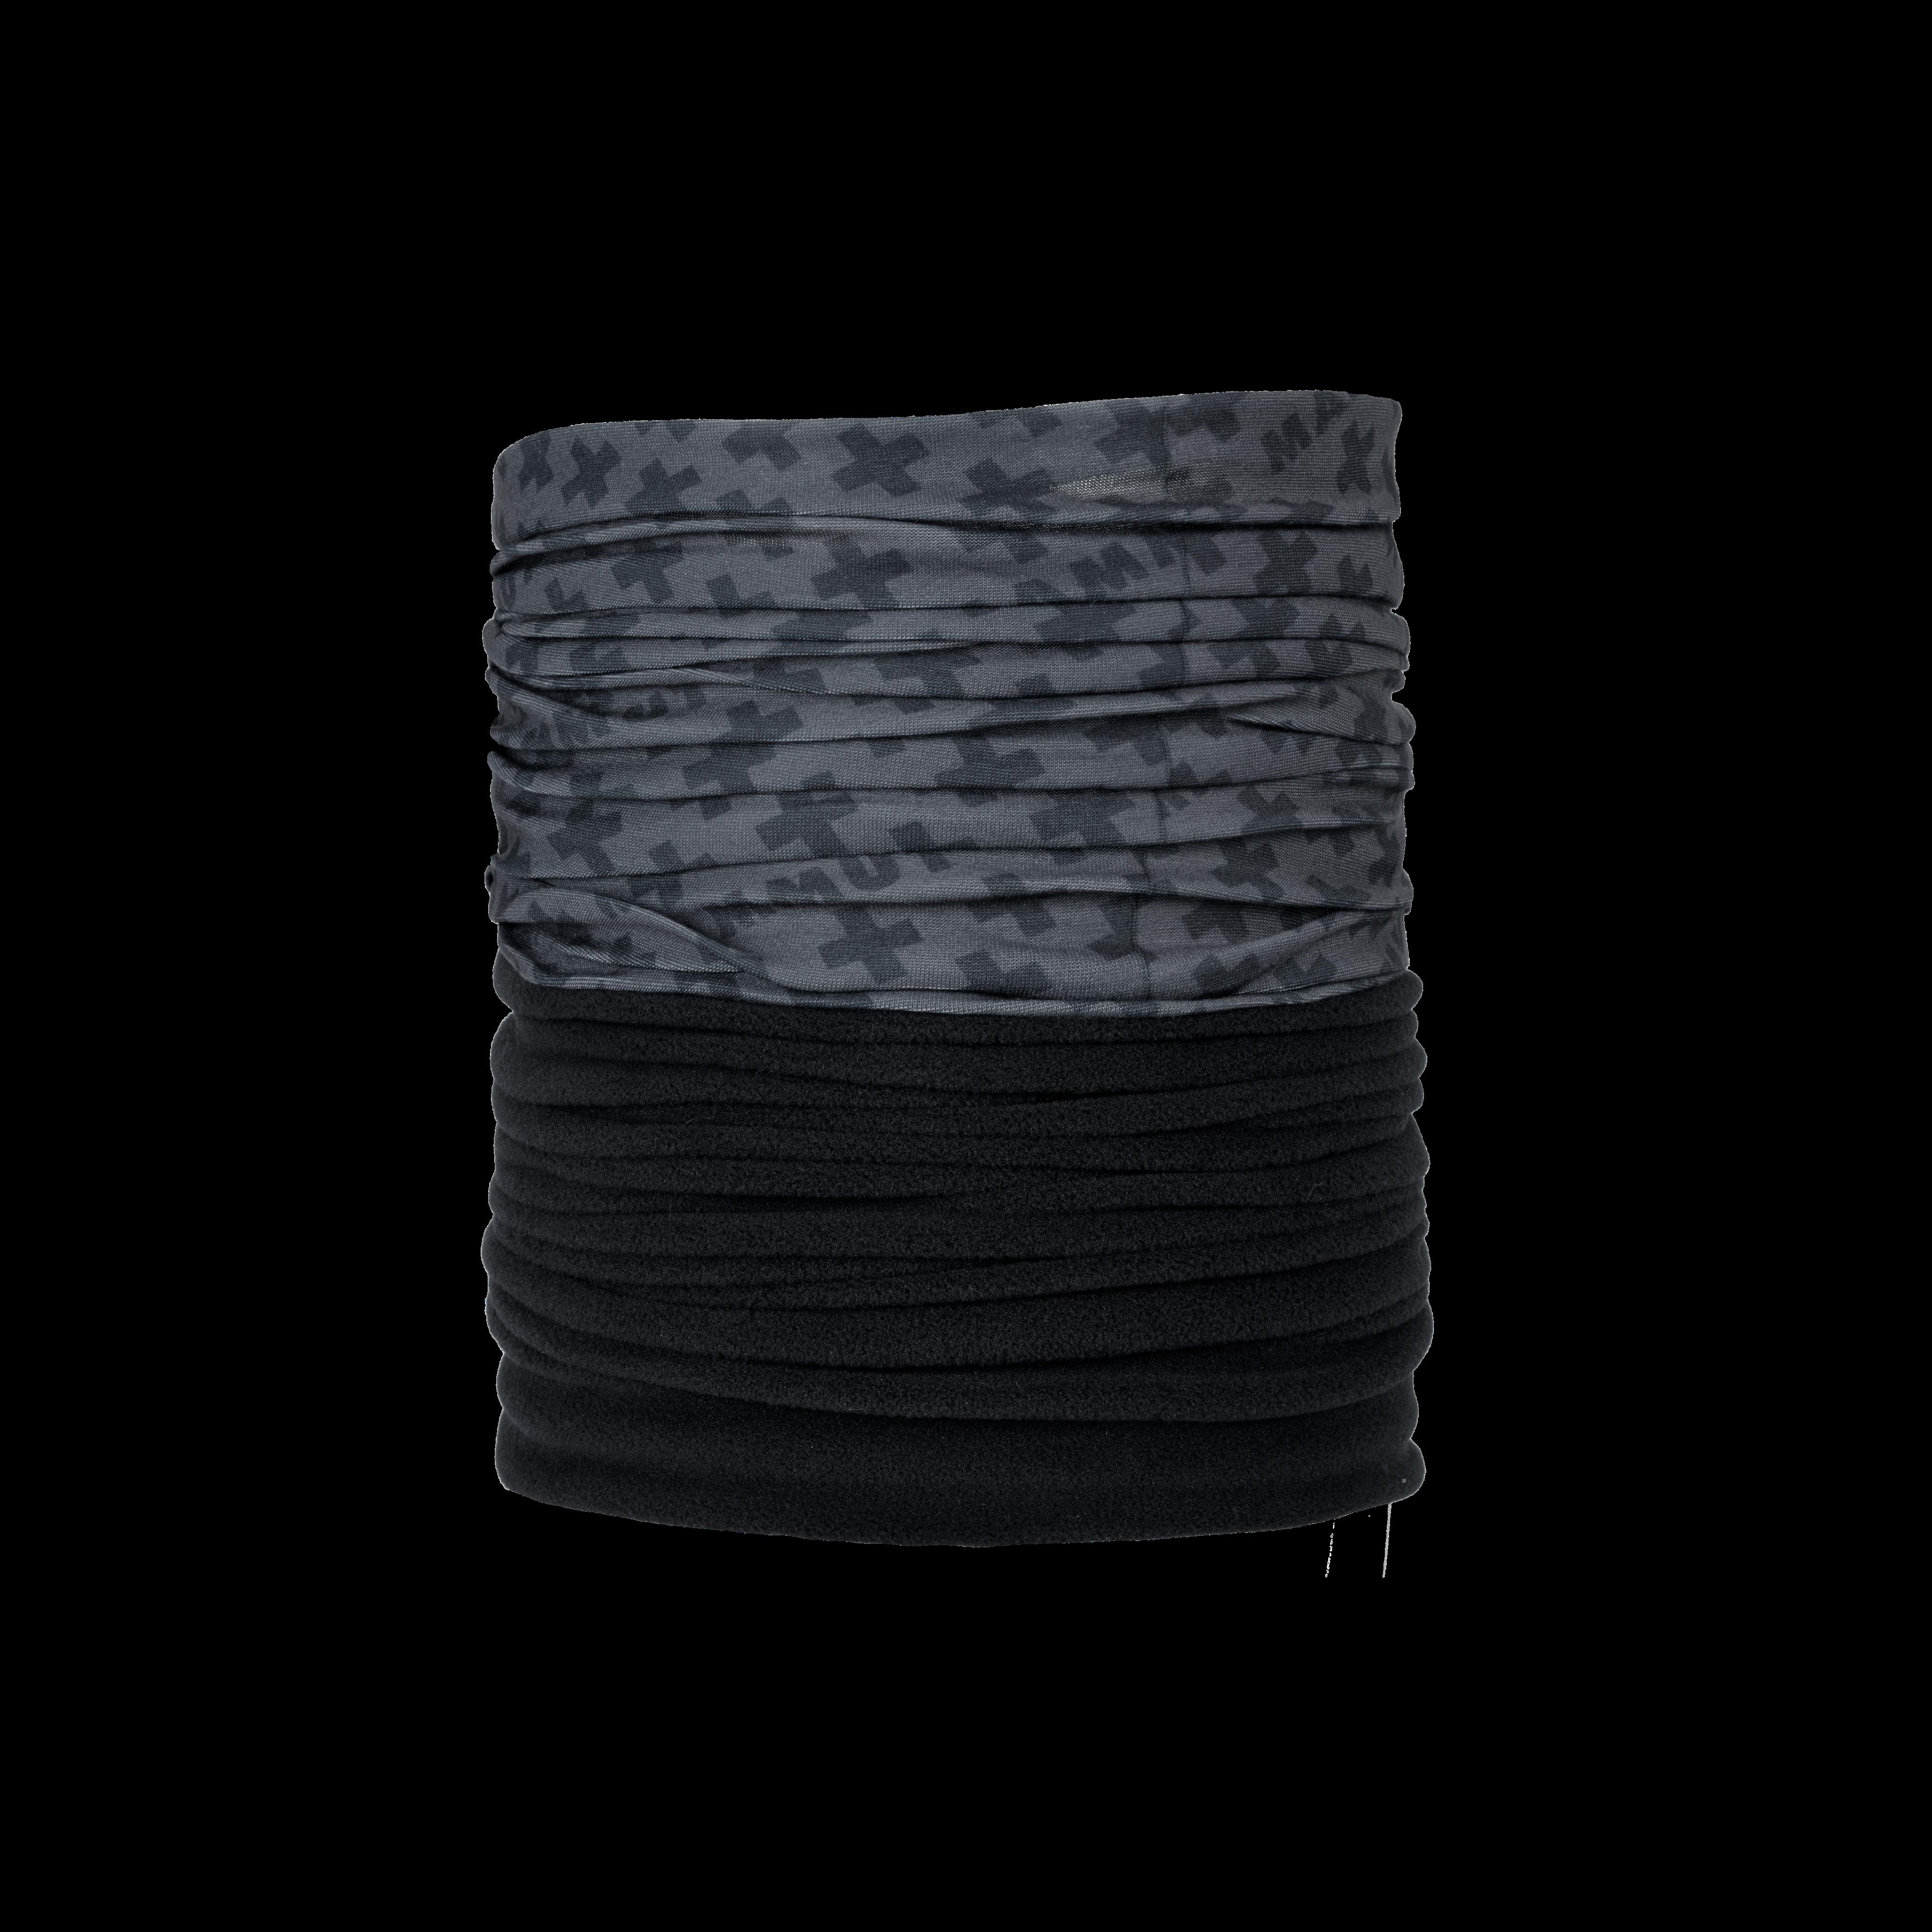 Mammut Thermo Neck Gaiter - black, one size thumbnail